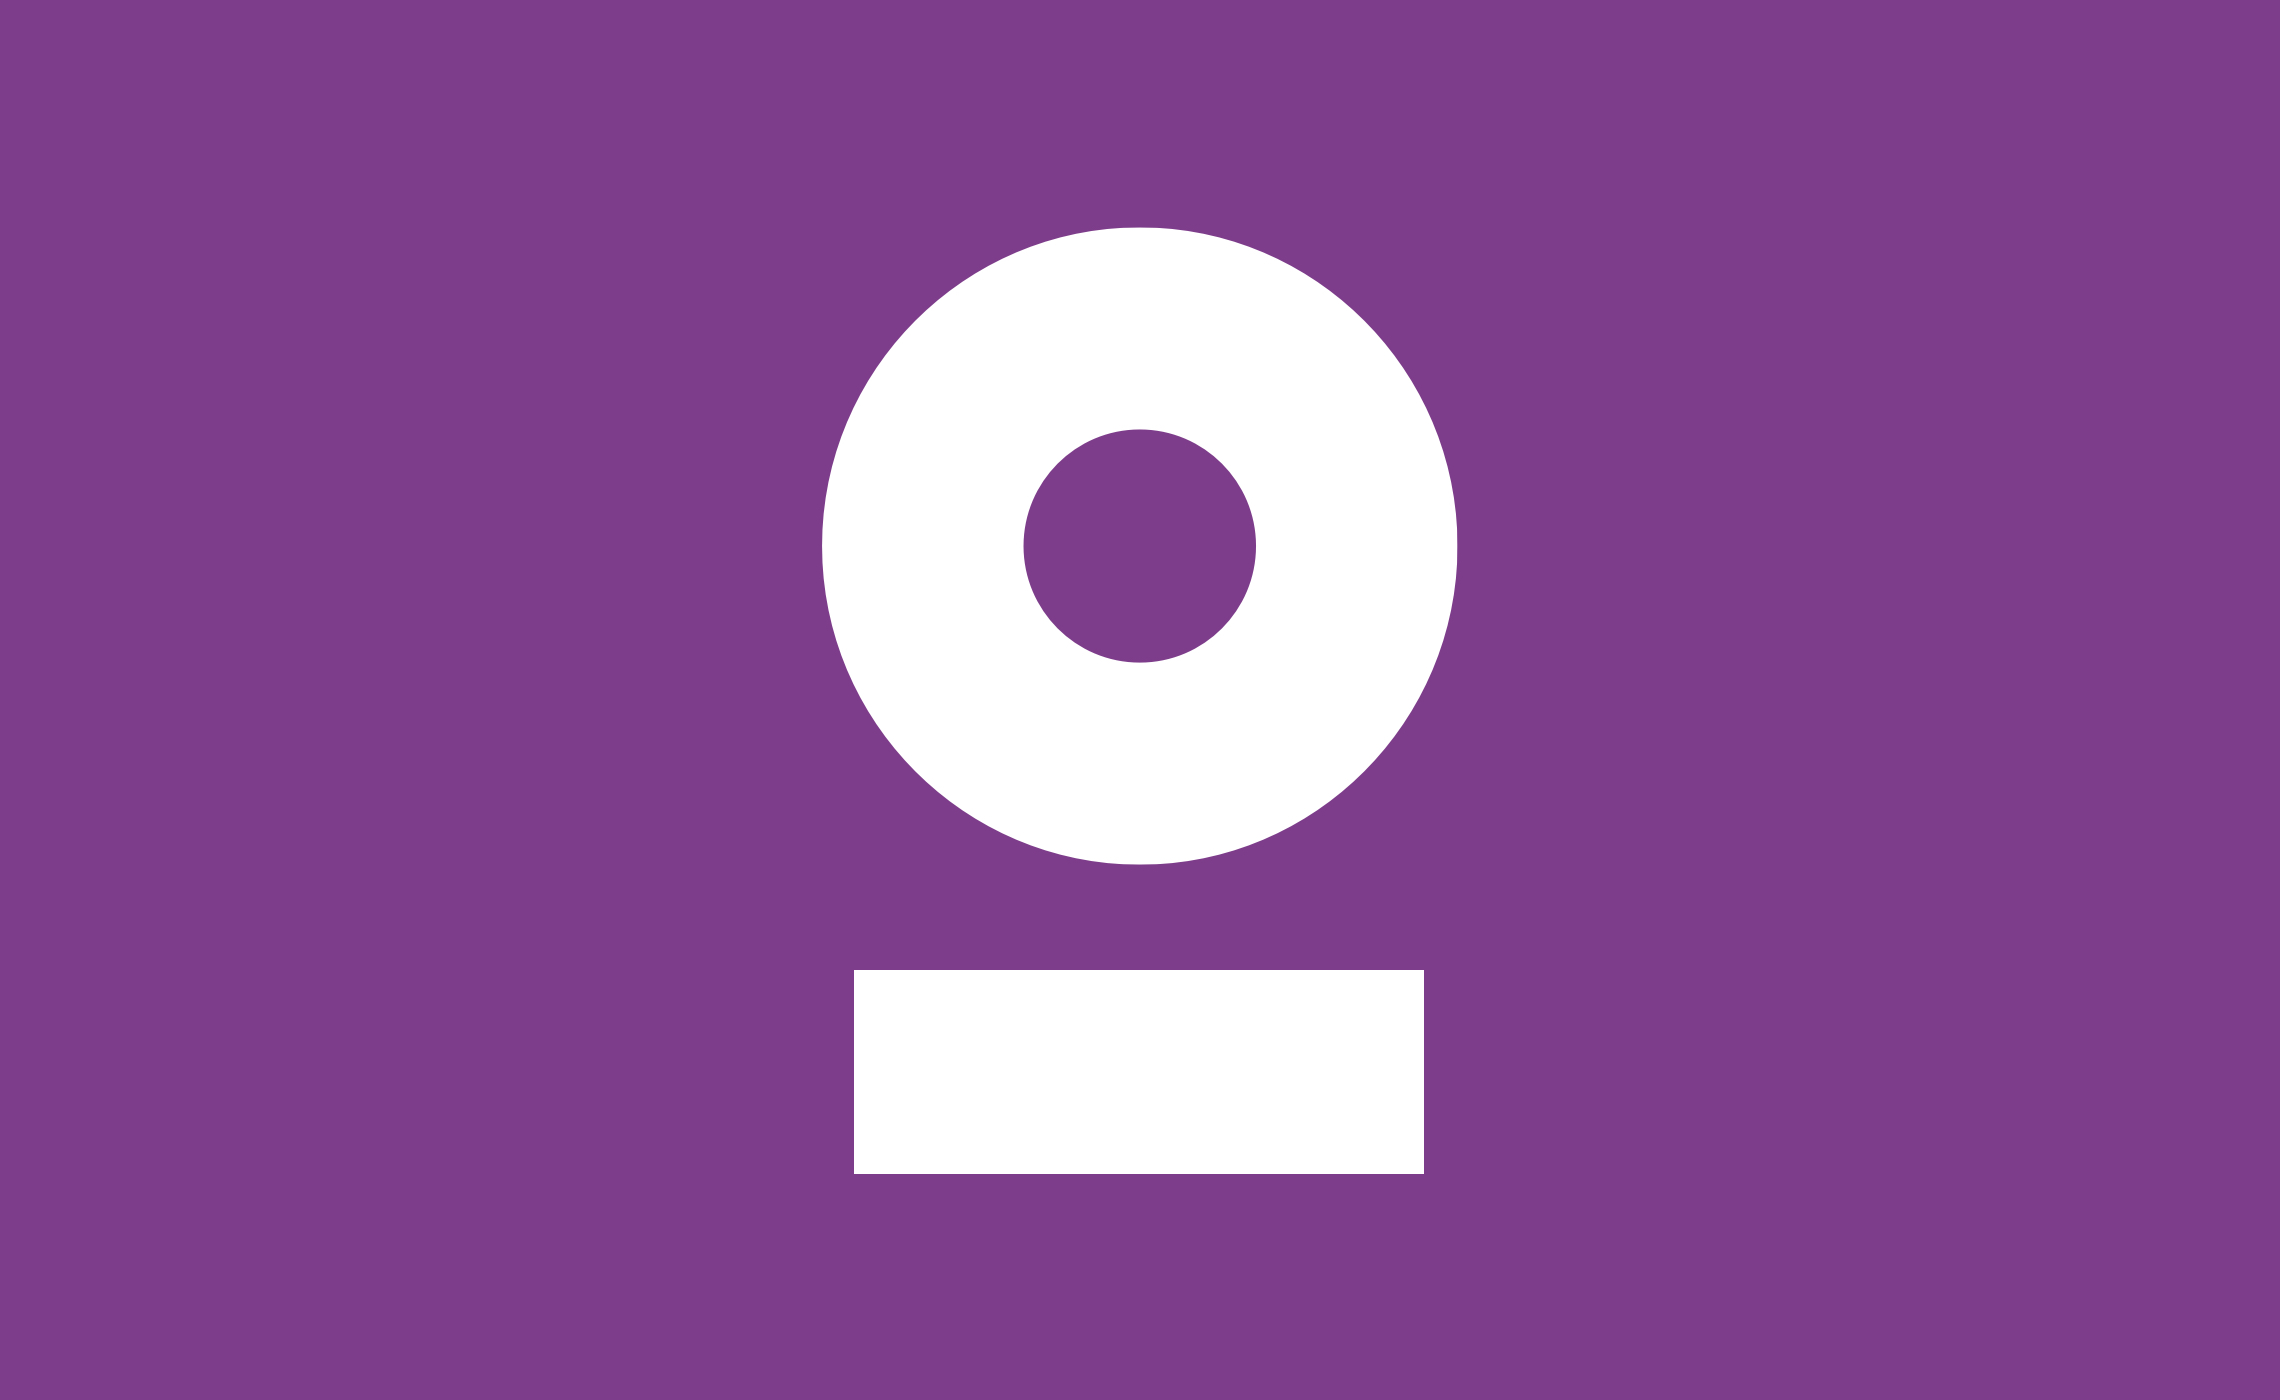 Rennison Consulting – brandmark